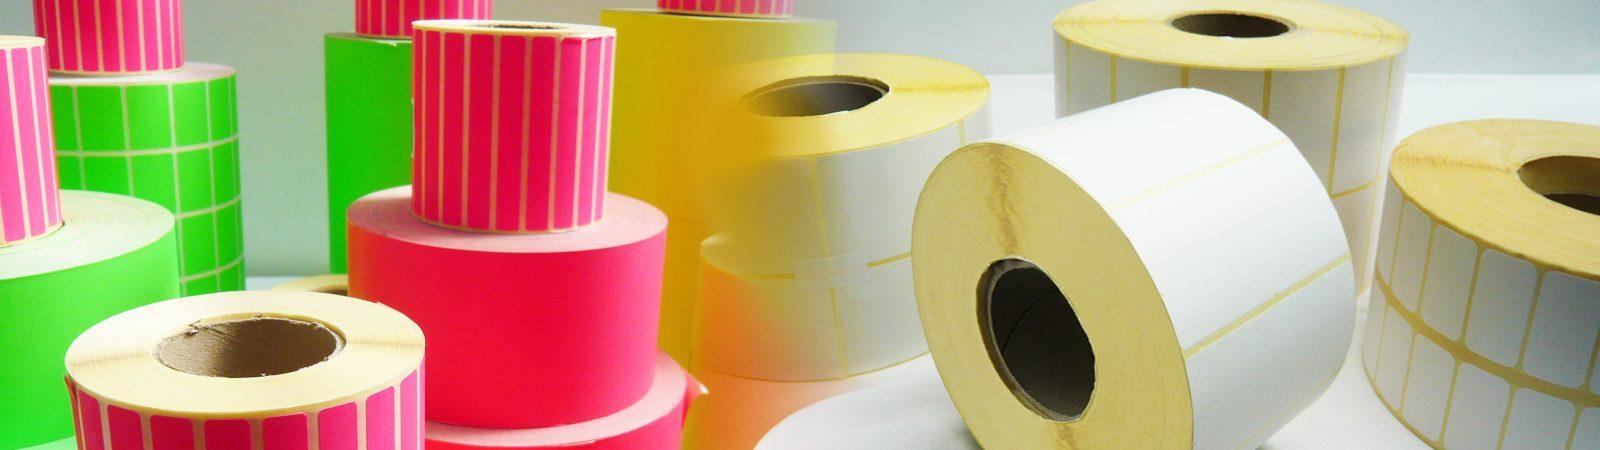 Image of thermal transfer printed labels